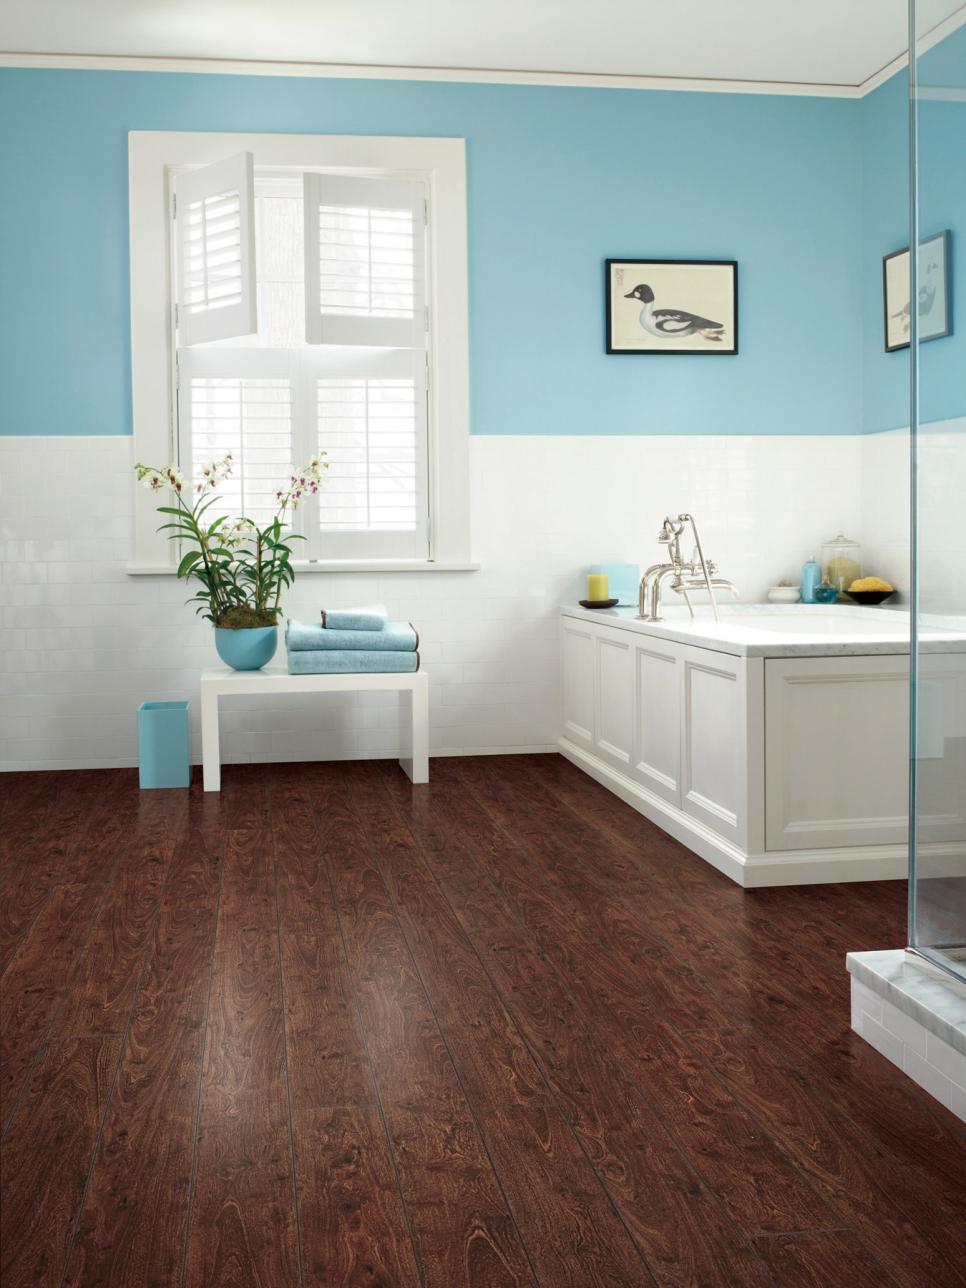 Bathroom with wood-look laminate flooring